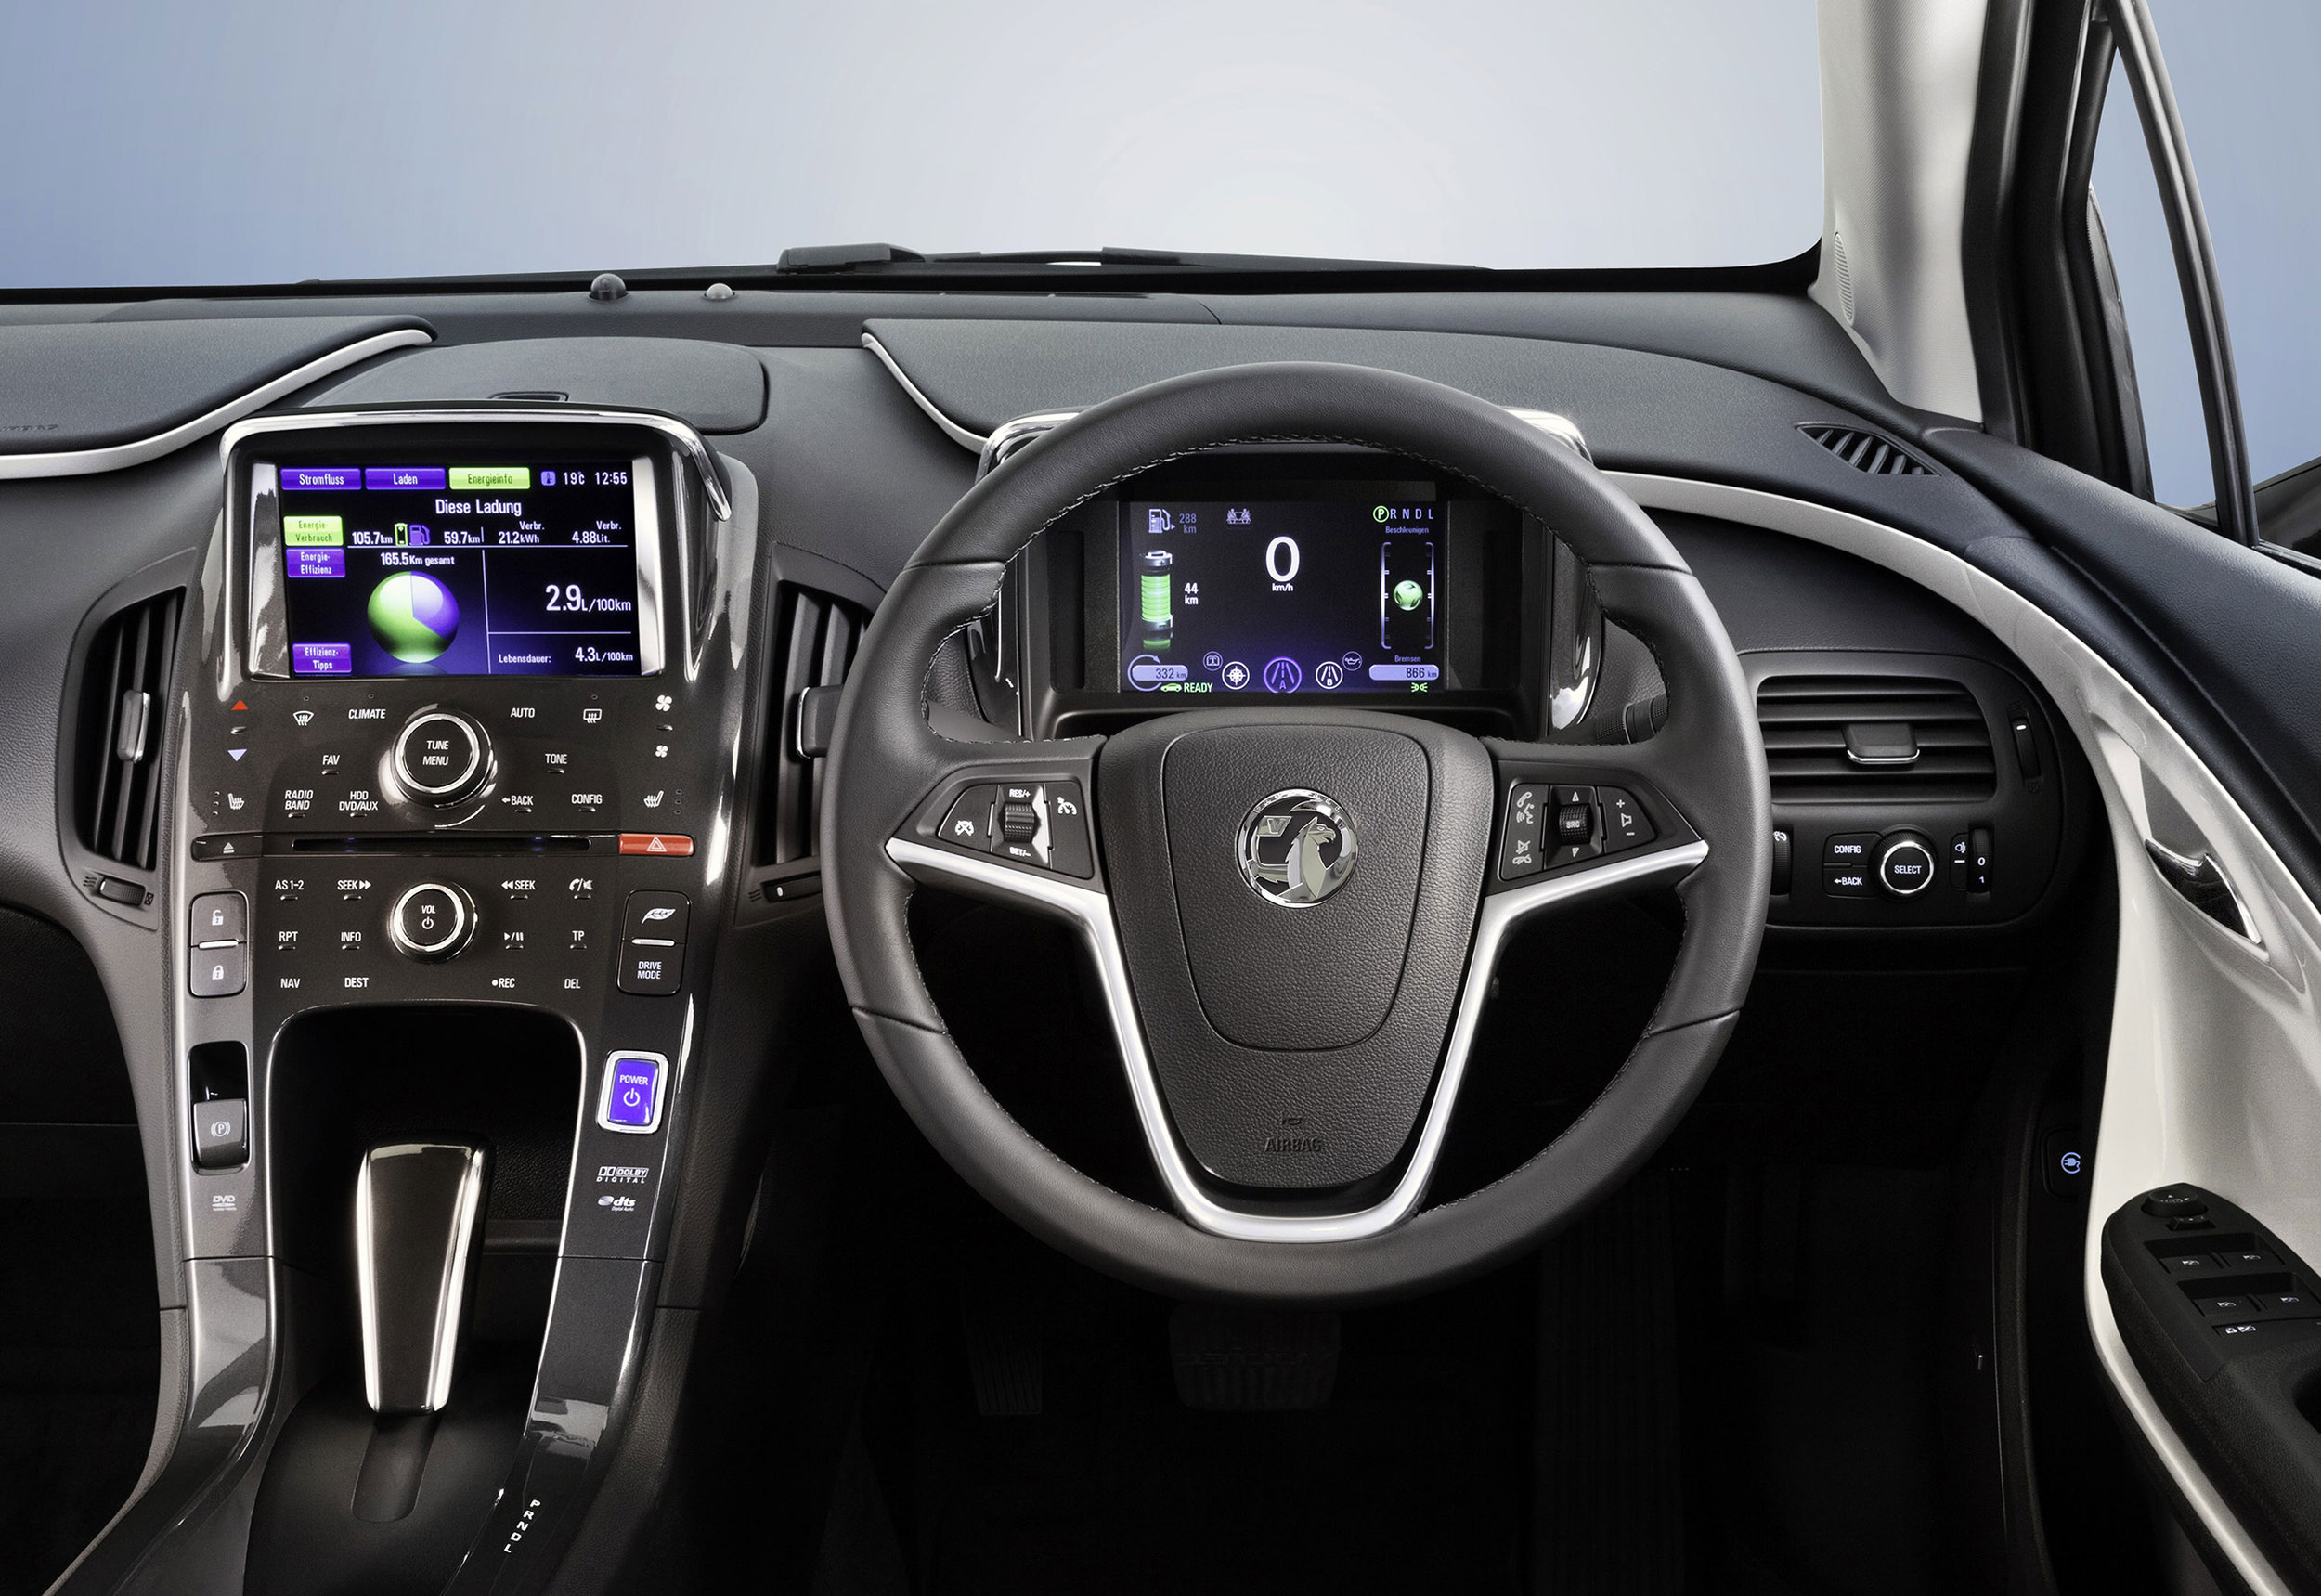 Vauxhall-Ampera-11.jpg